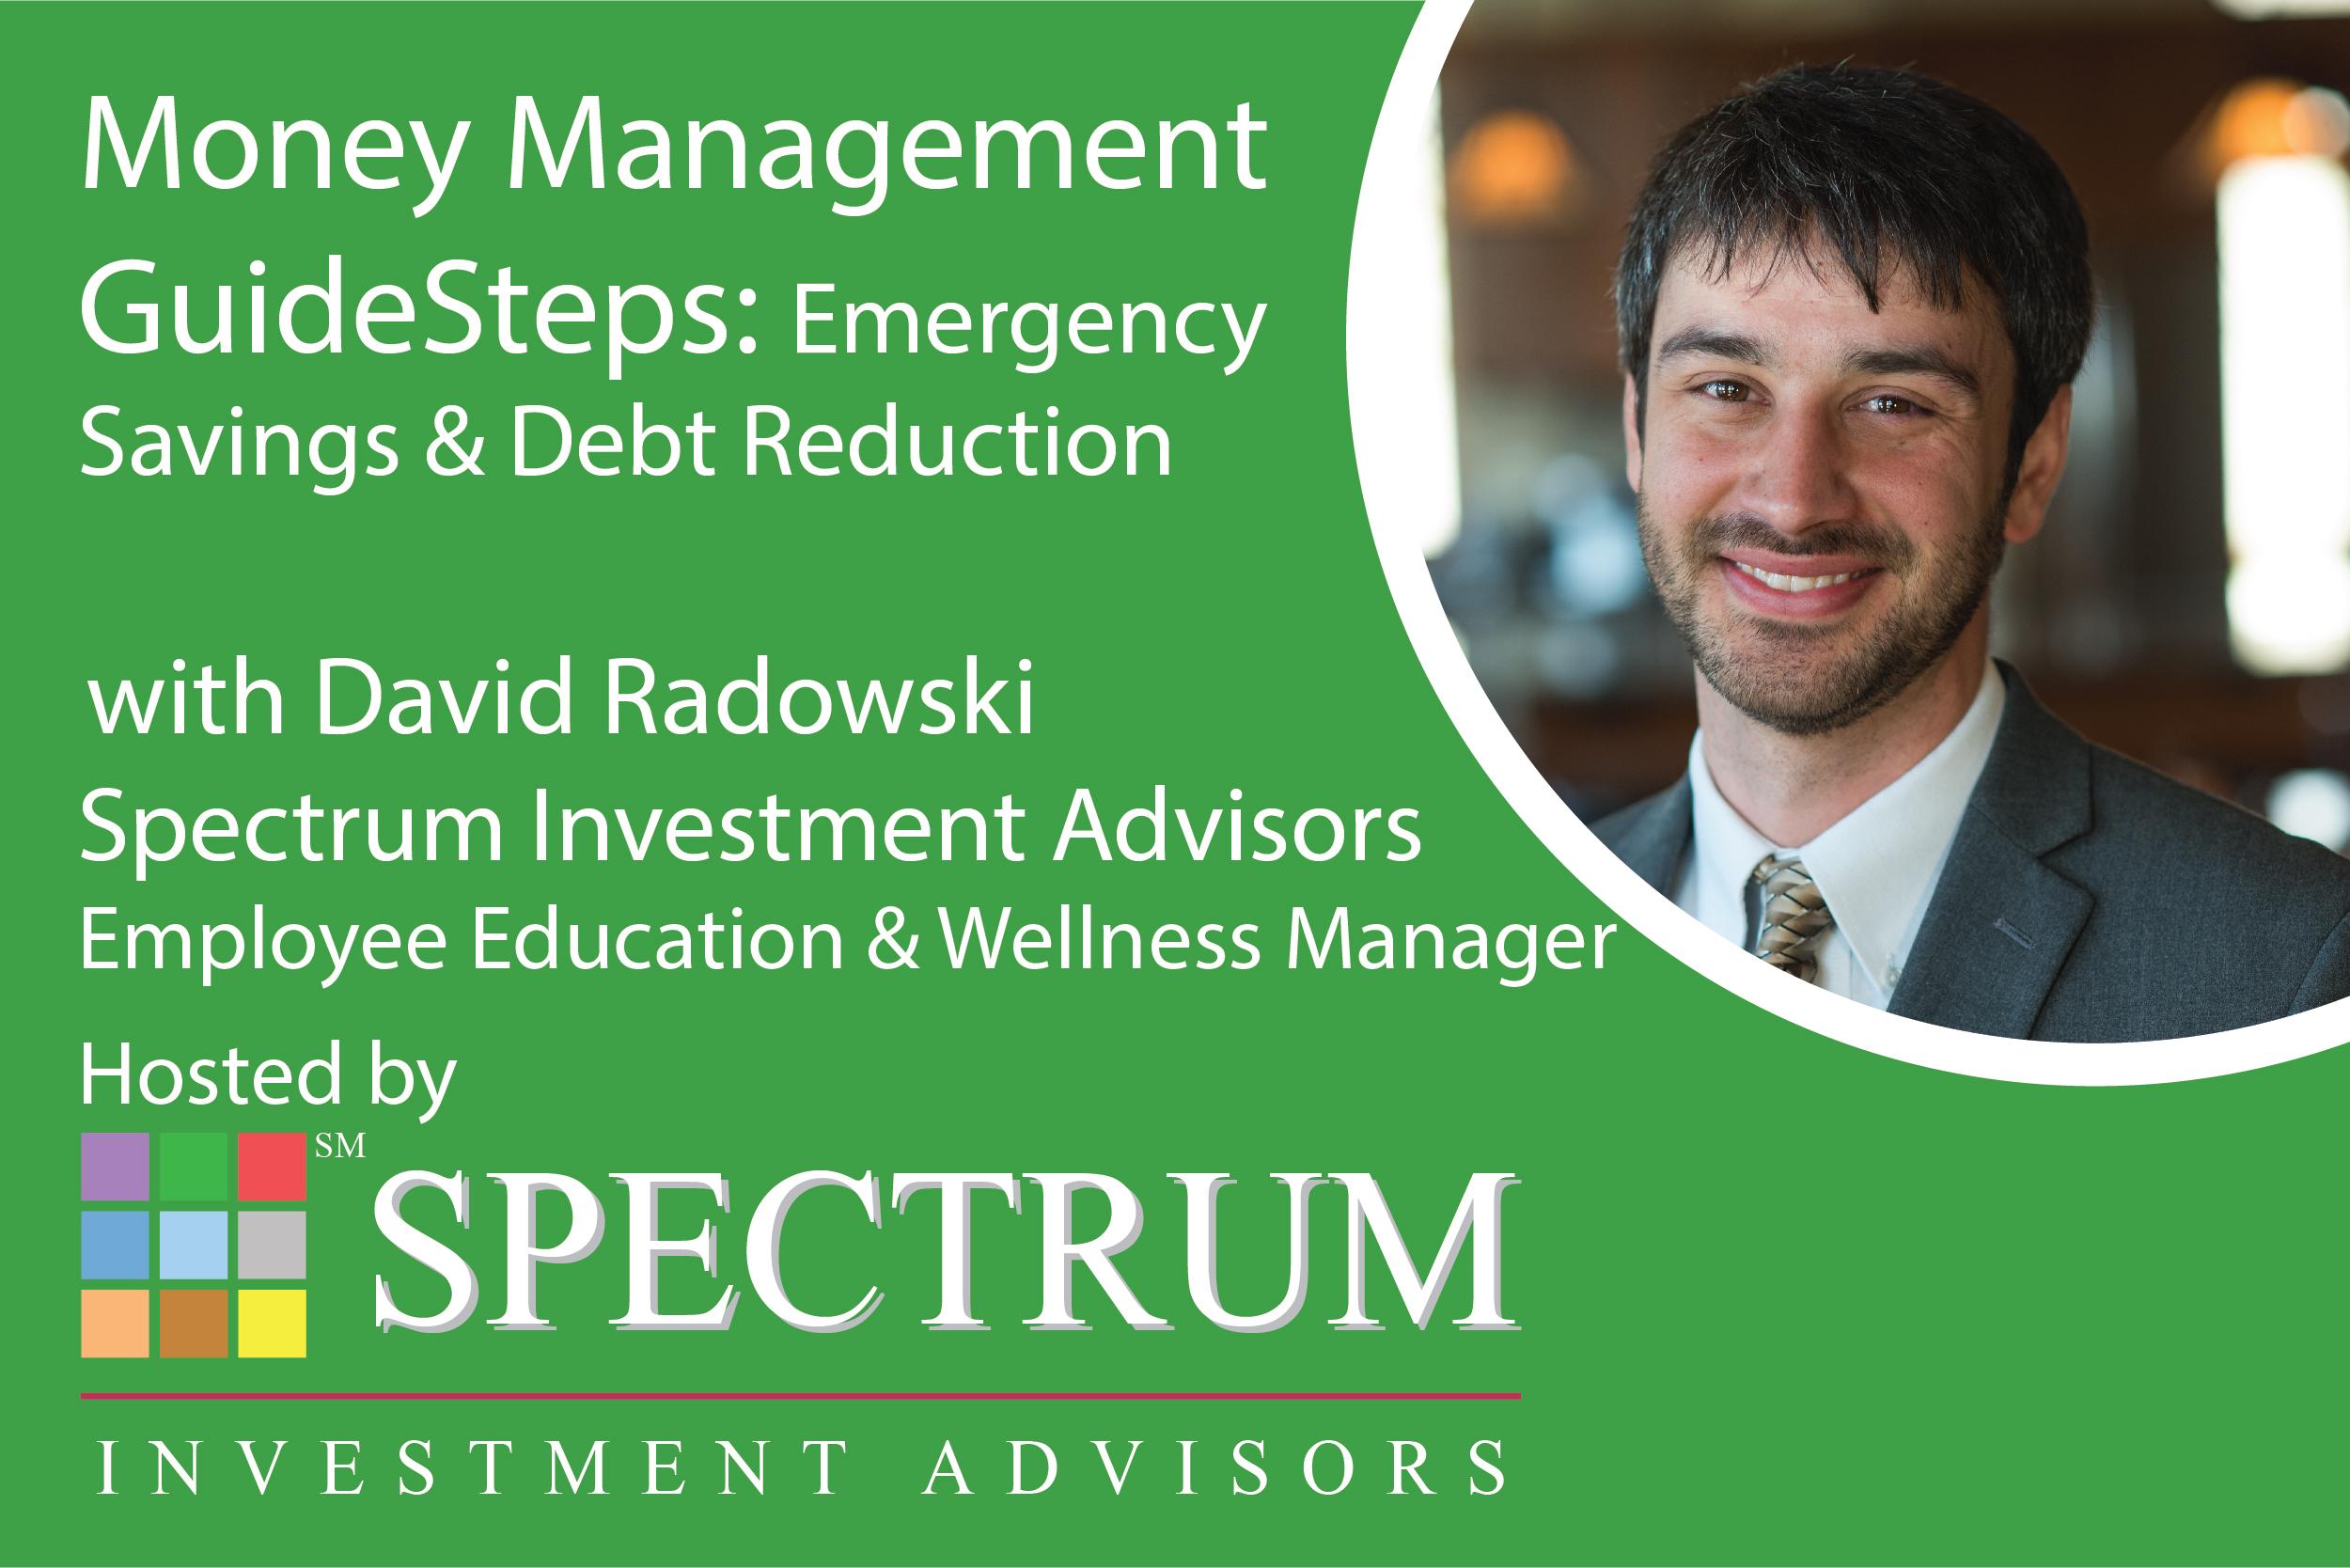 SIA Website David Radowski 2021 02 GuideSteps for the New Year- Emergency Savings & Debt Reduction (RGB)